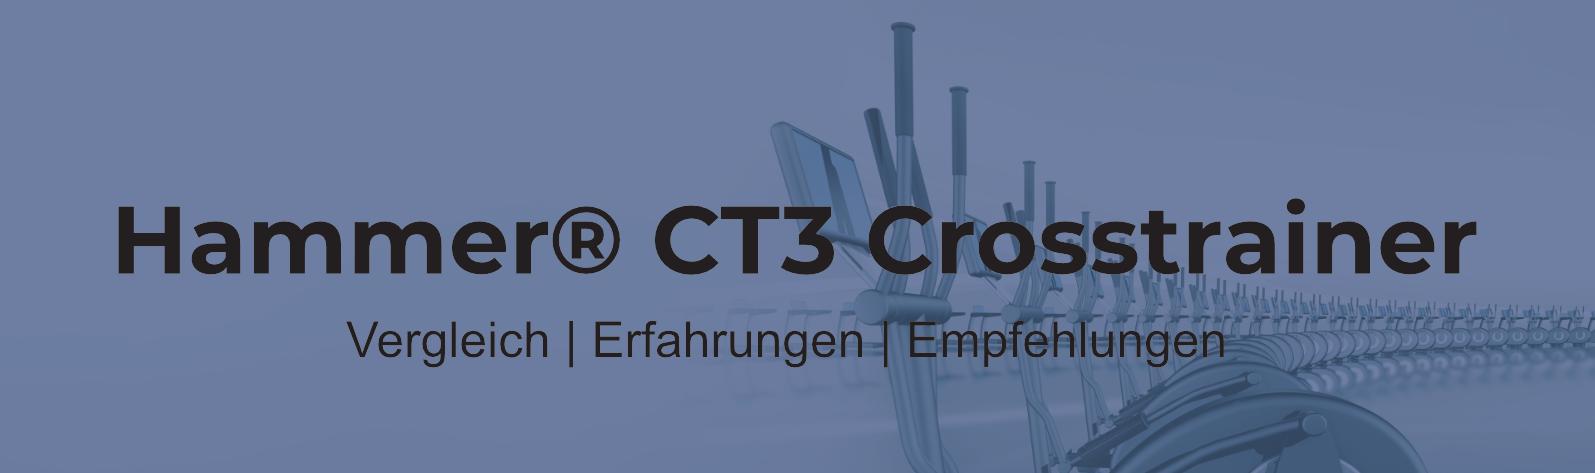 Hammer CT3, 4120® Crosstrainer Ellyptech